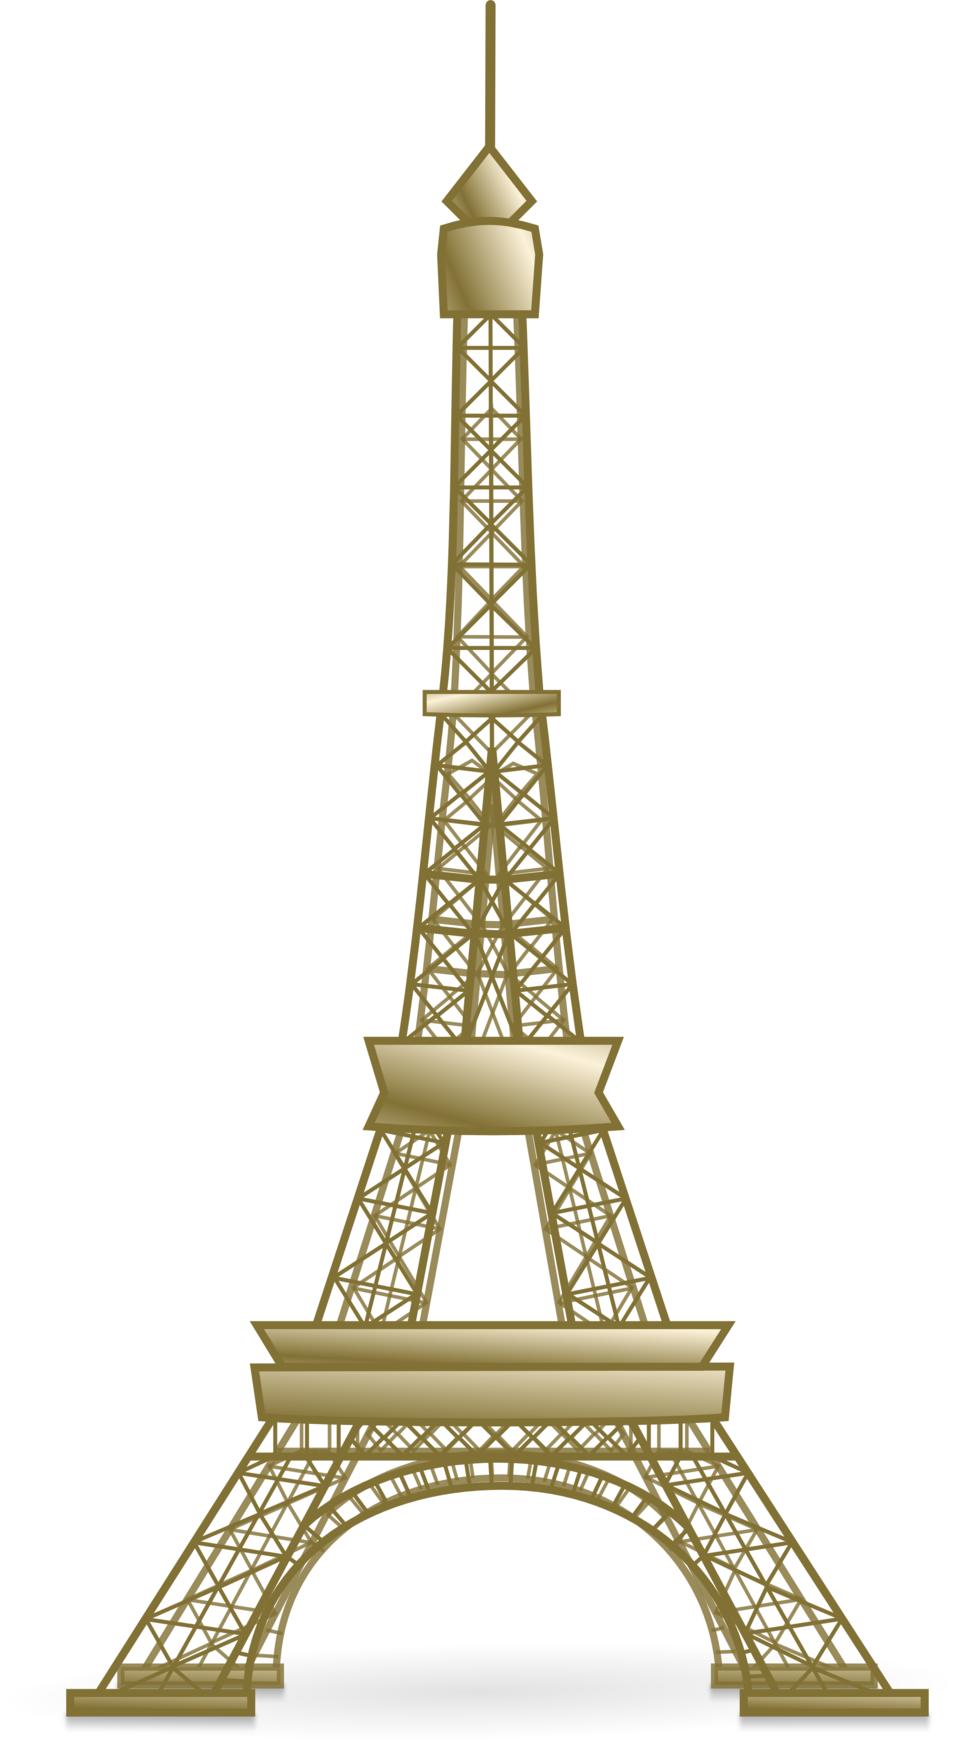 Illustration Of The Eiffel Tower-Illustration of the Eiffel Tower-15